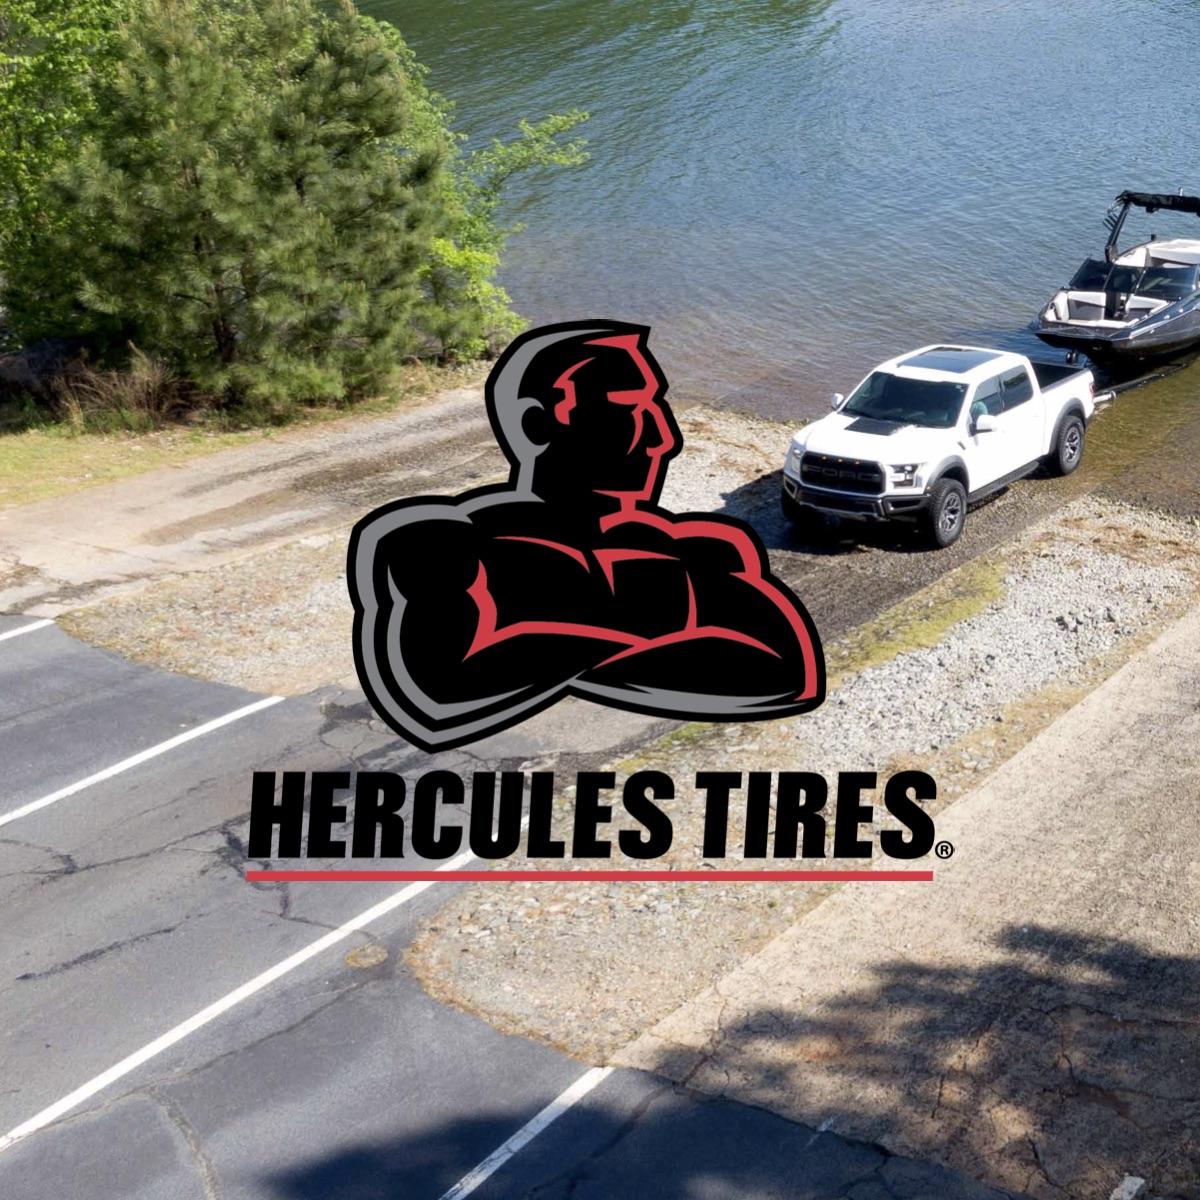 www.herculestire.com